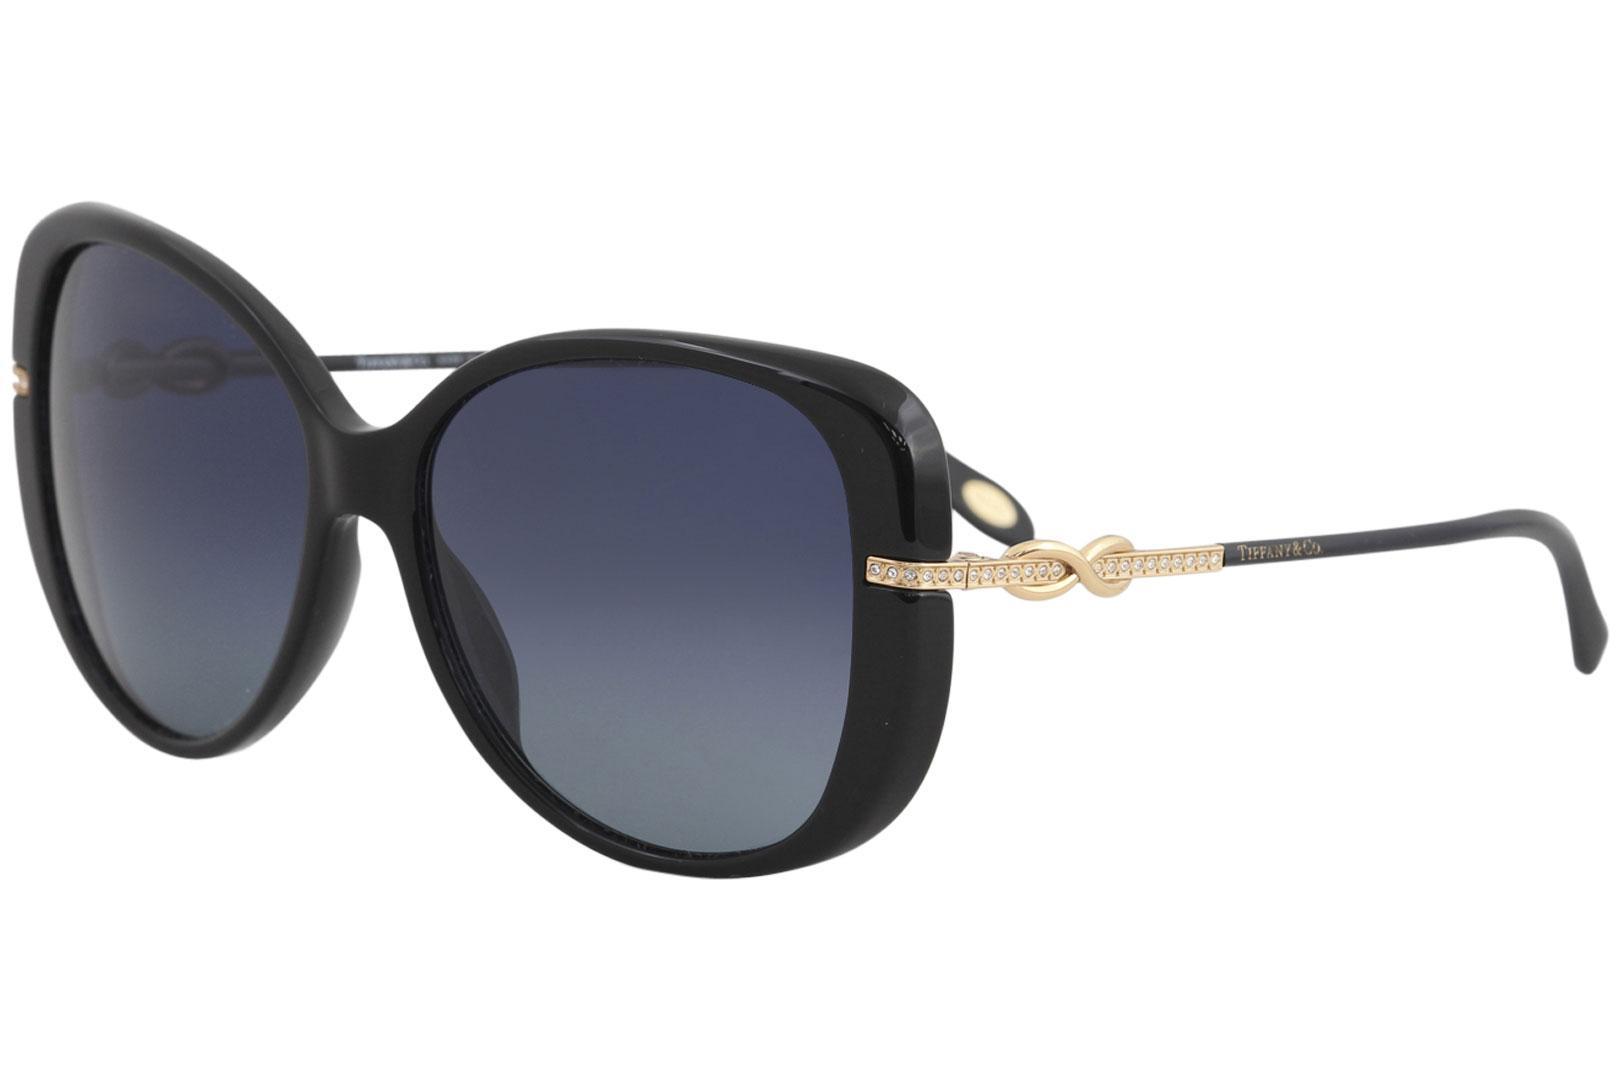 fdac74cf71 Women's TF4126B TF/4126/B Fashion Butterfly Polarized Sunglasses by Tiffany  & Co.